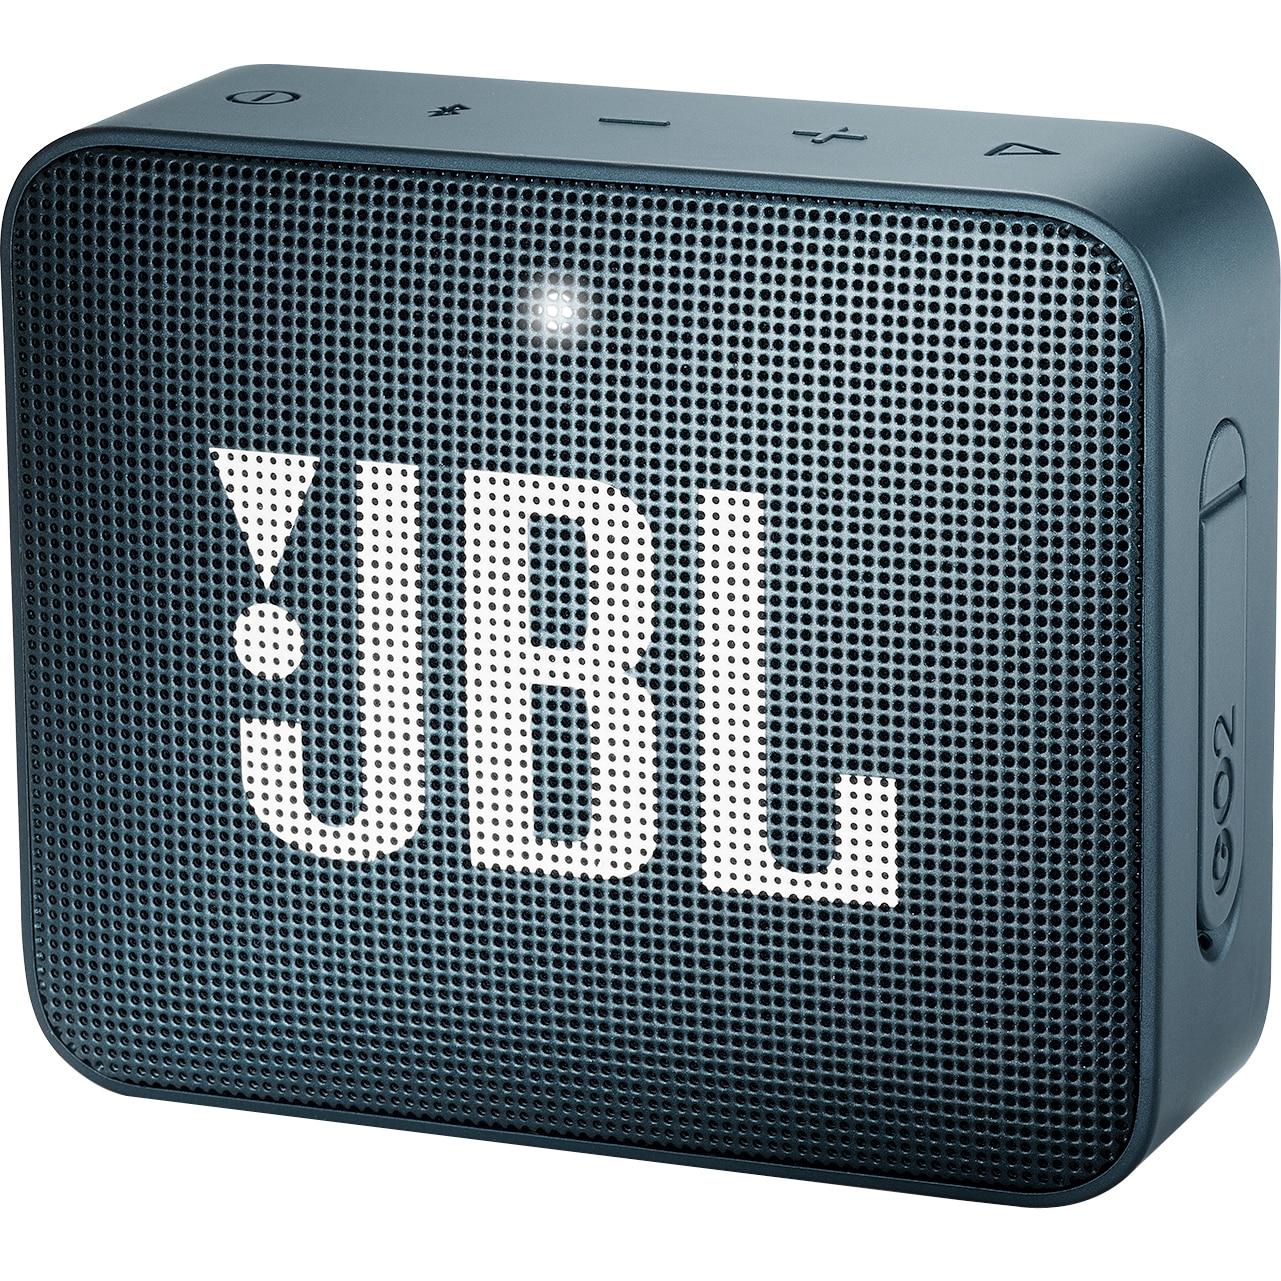 Fotografie Boxa portabila JBL Go2, IPX7, navy